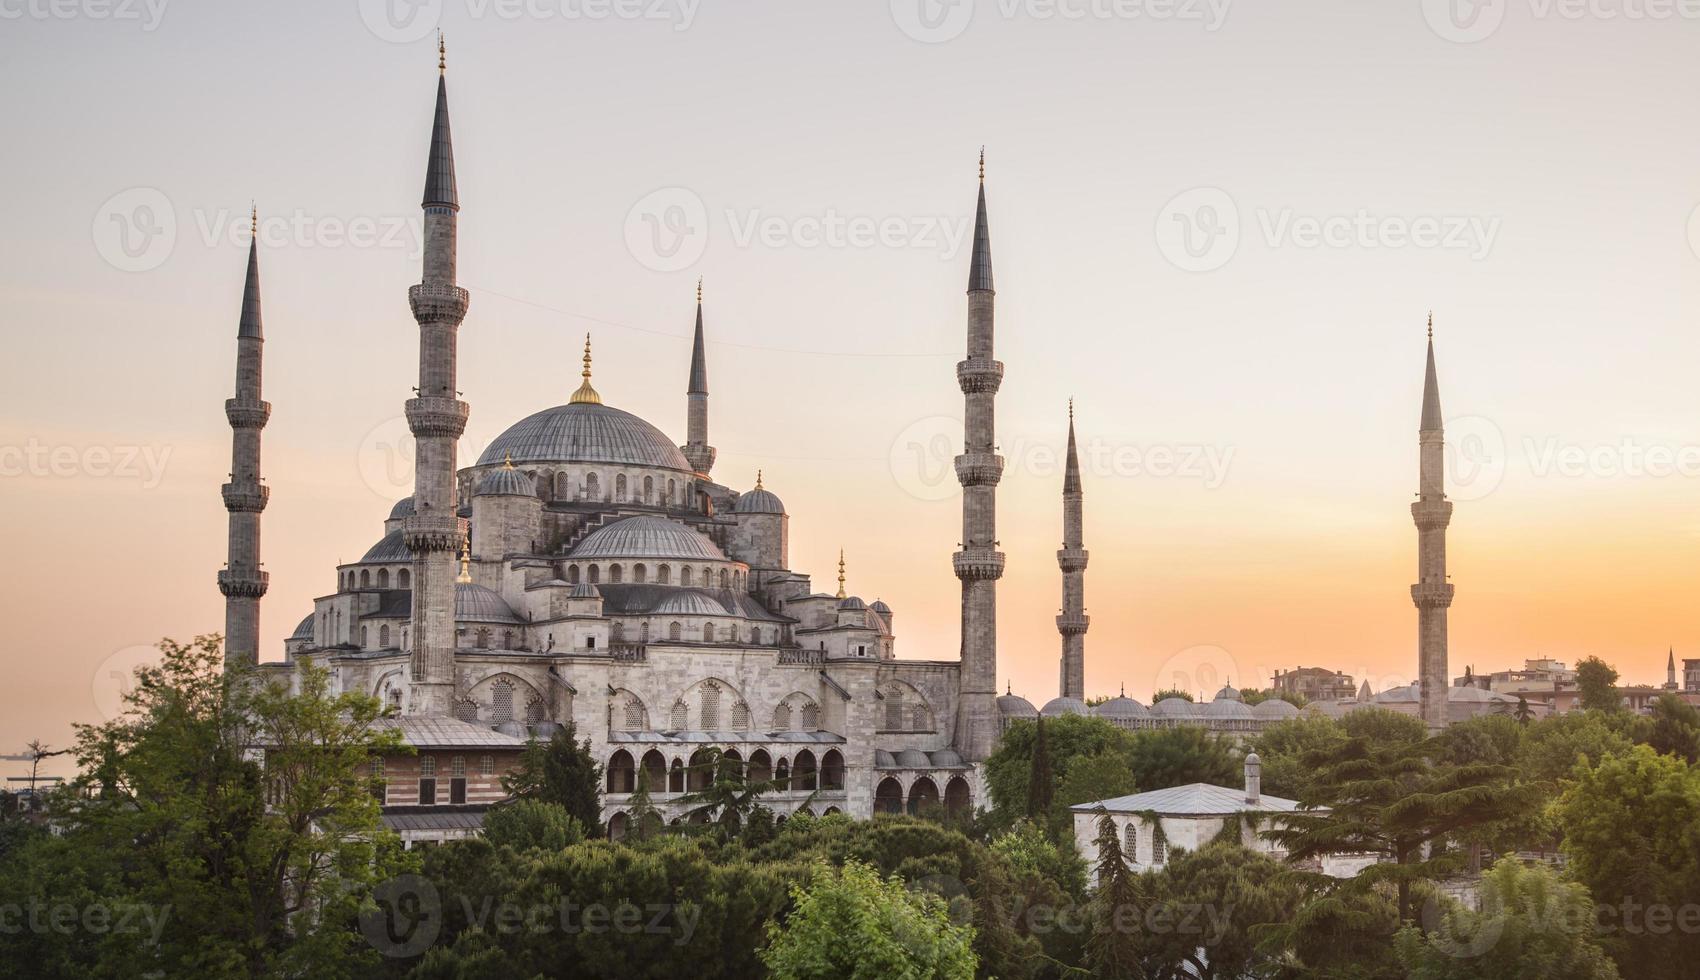 pôr do sol sobre a mesquita azul no distrito de sultanahmet, Istambul, Turquia. foto